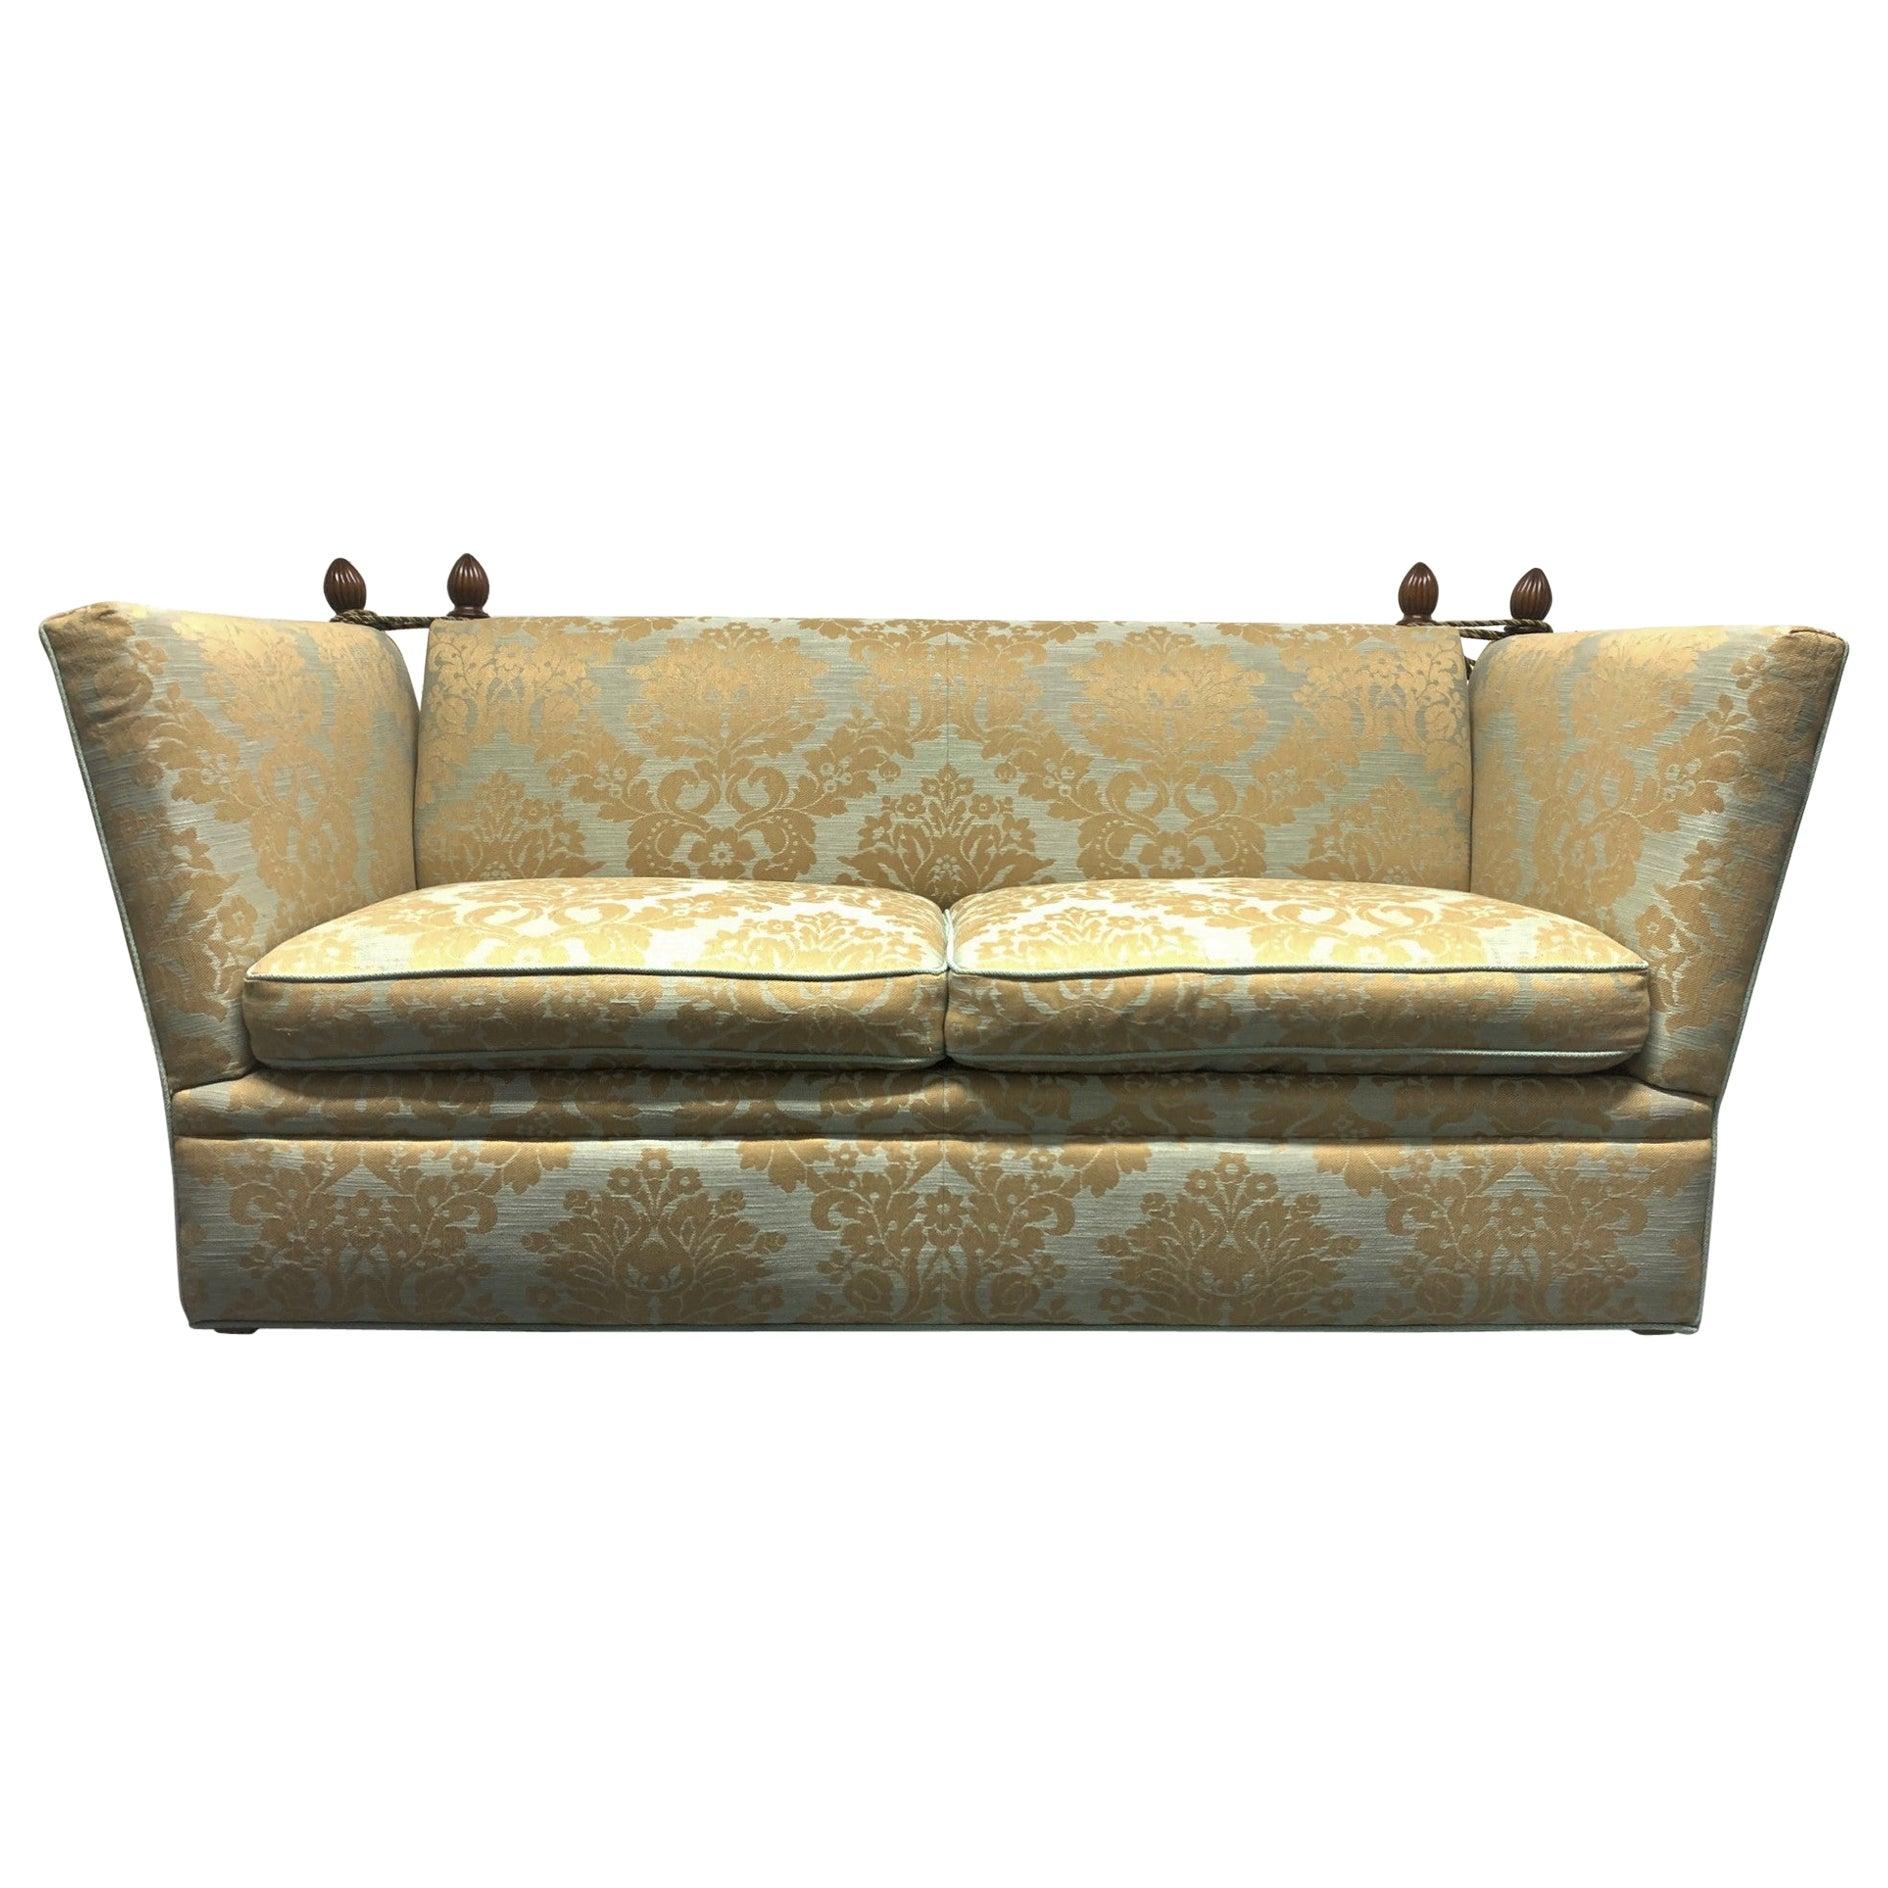 Knole Sofa with Custom Upholstery